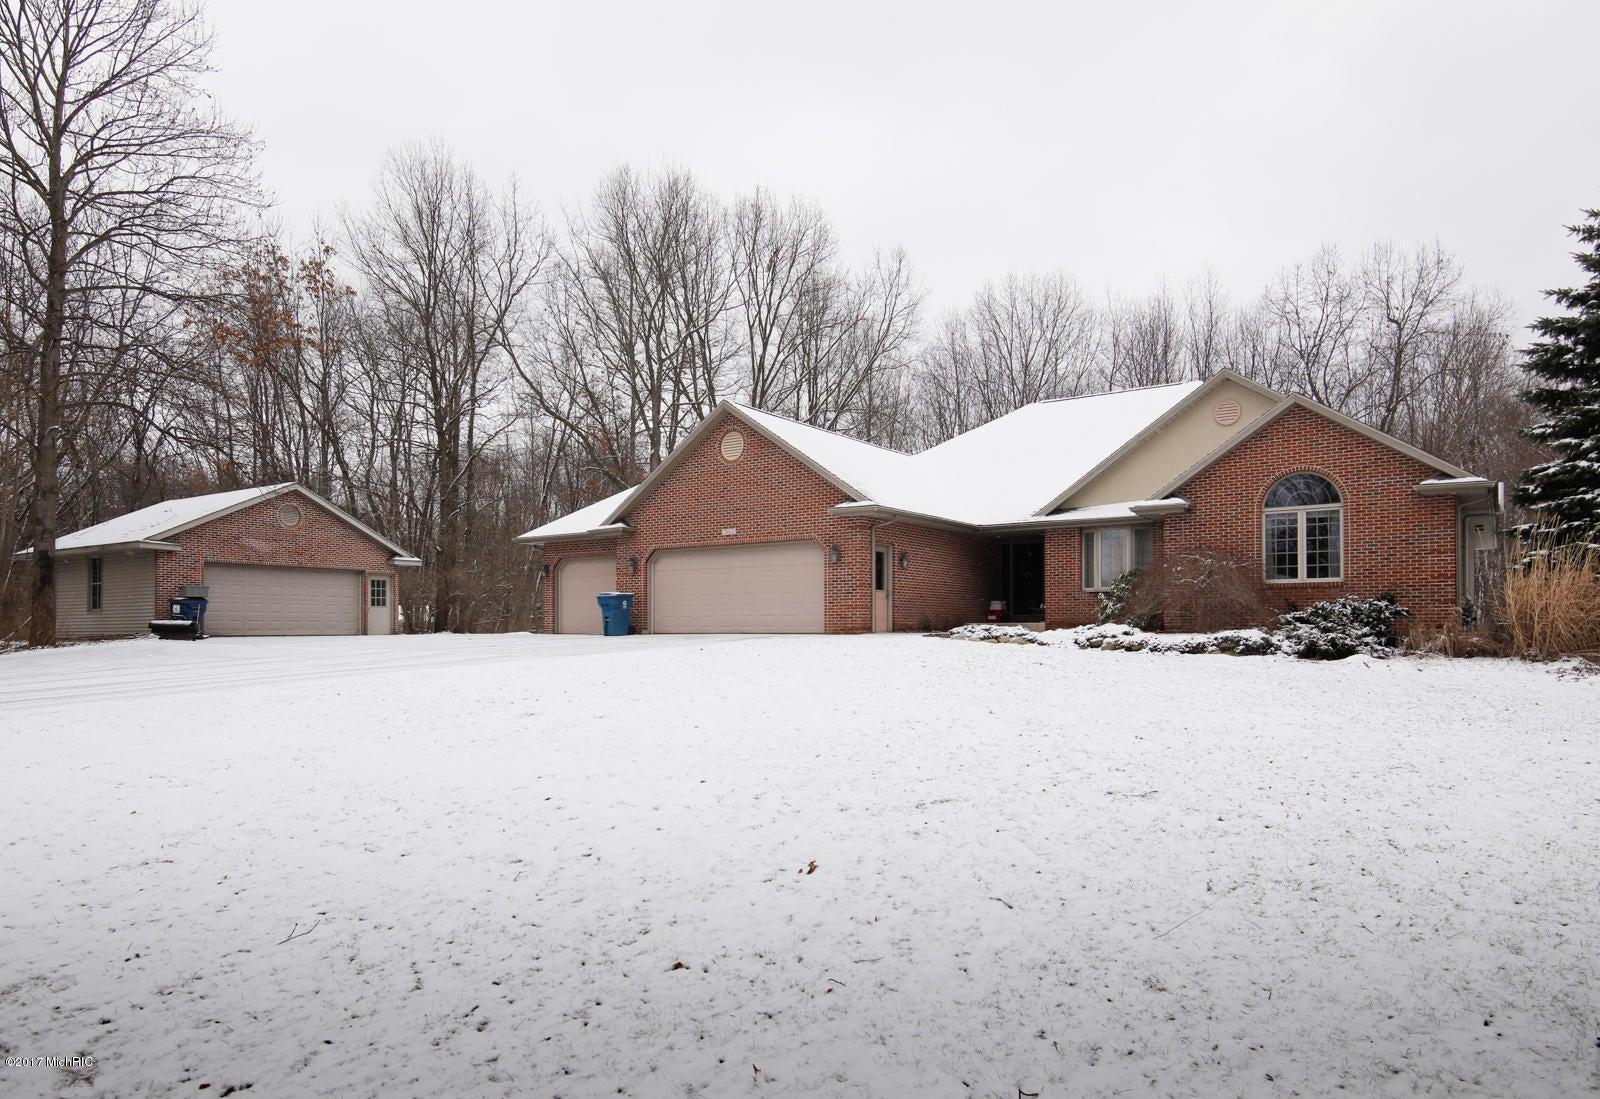 Single Family Home for Sale at 2462 10th Kalamazoo, Michigan 49009 United States